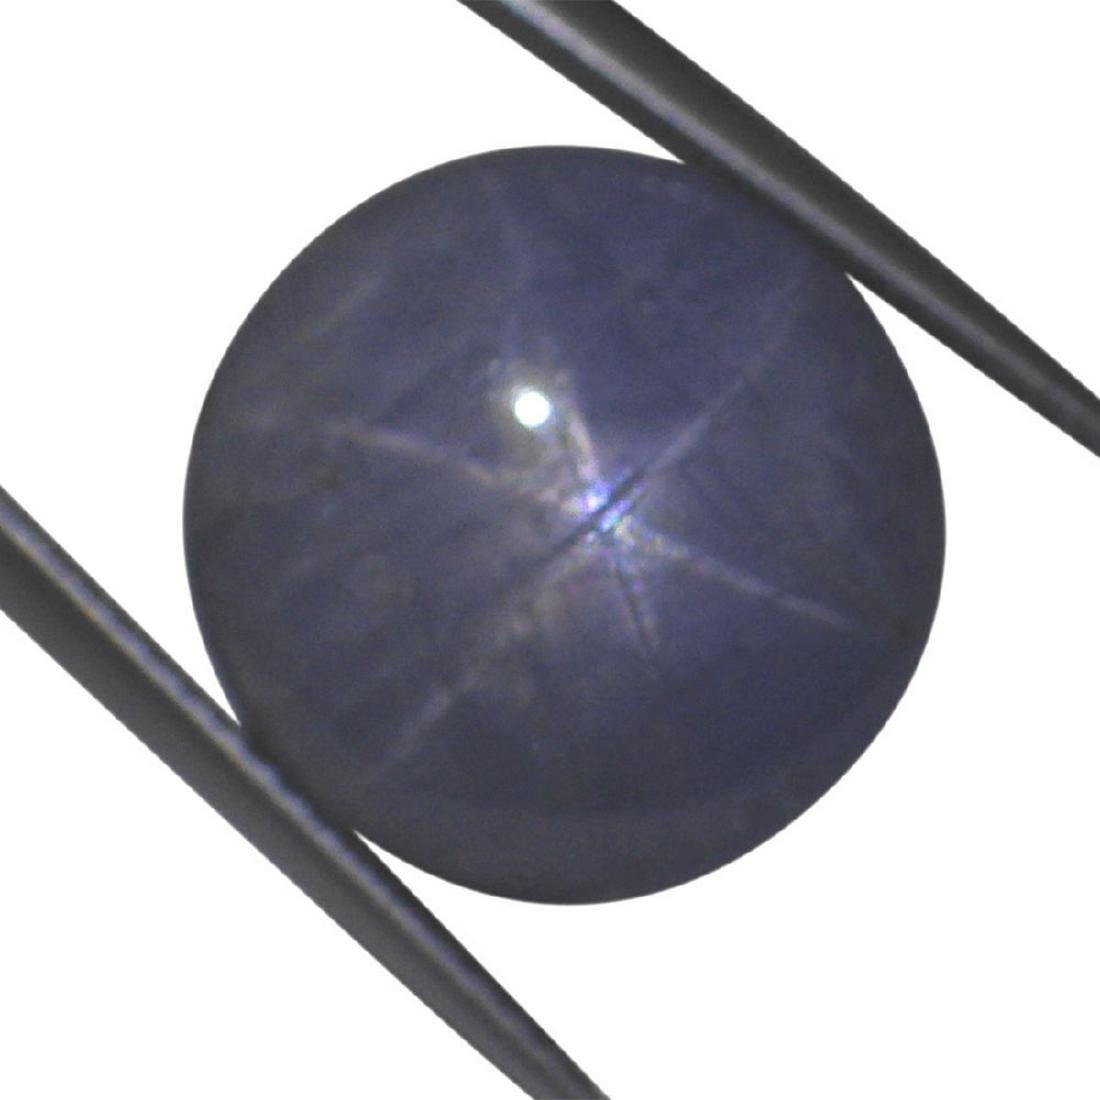 7.46 Carat Loose Round Star Sapphire - 5